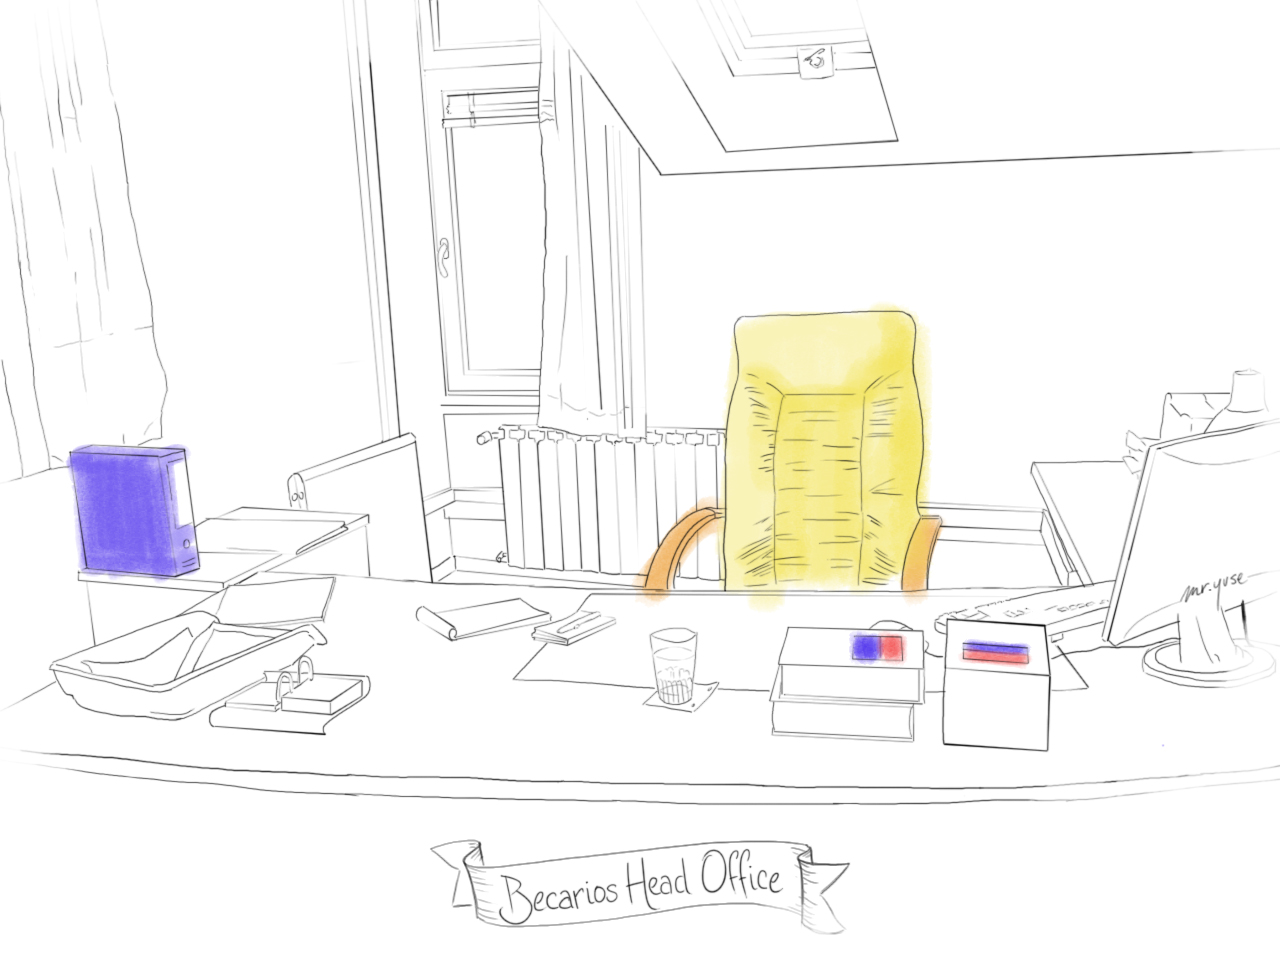 00.BecariosHeadOffice